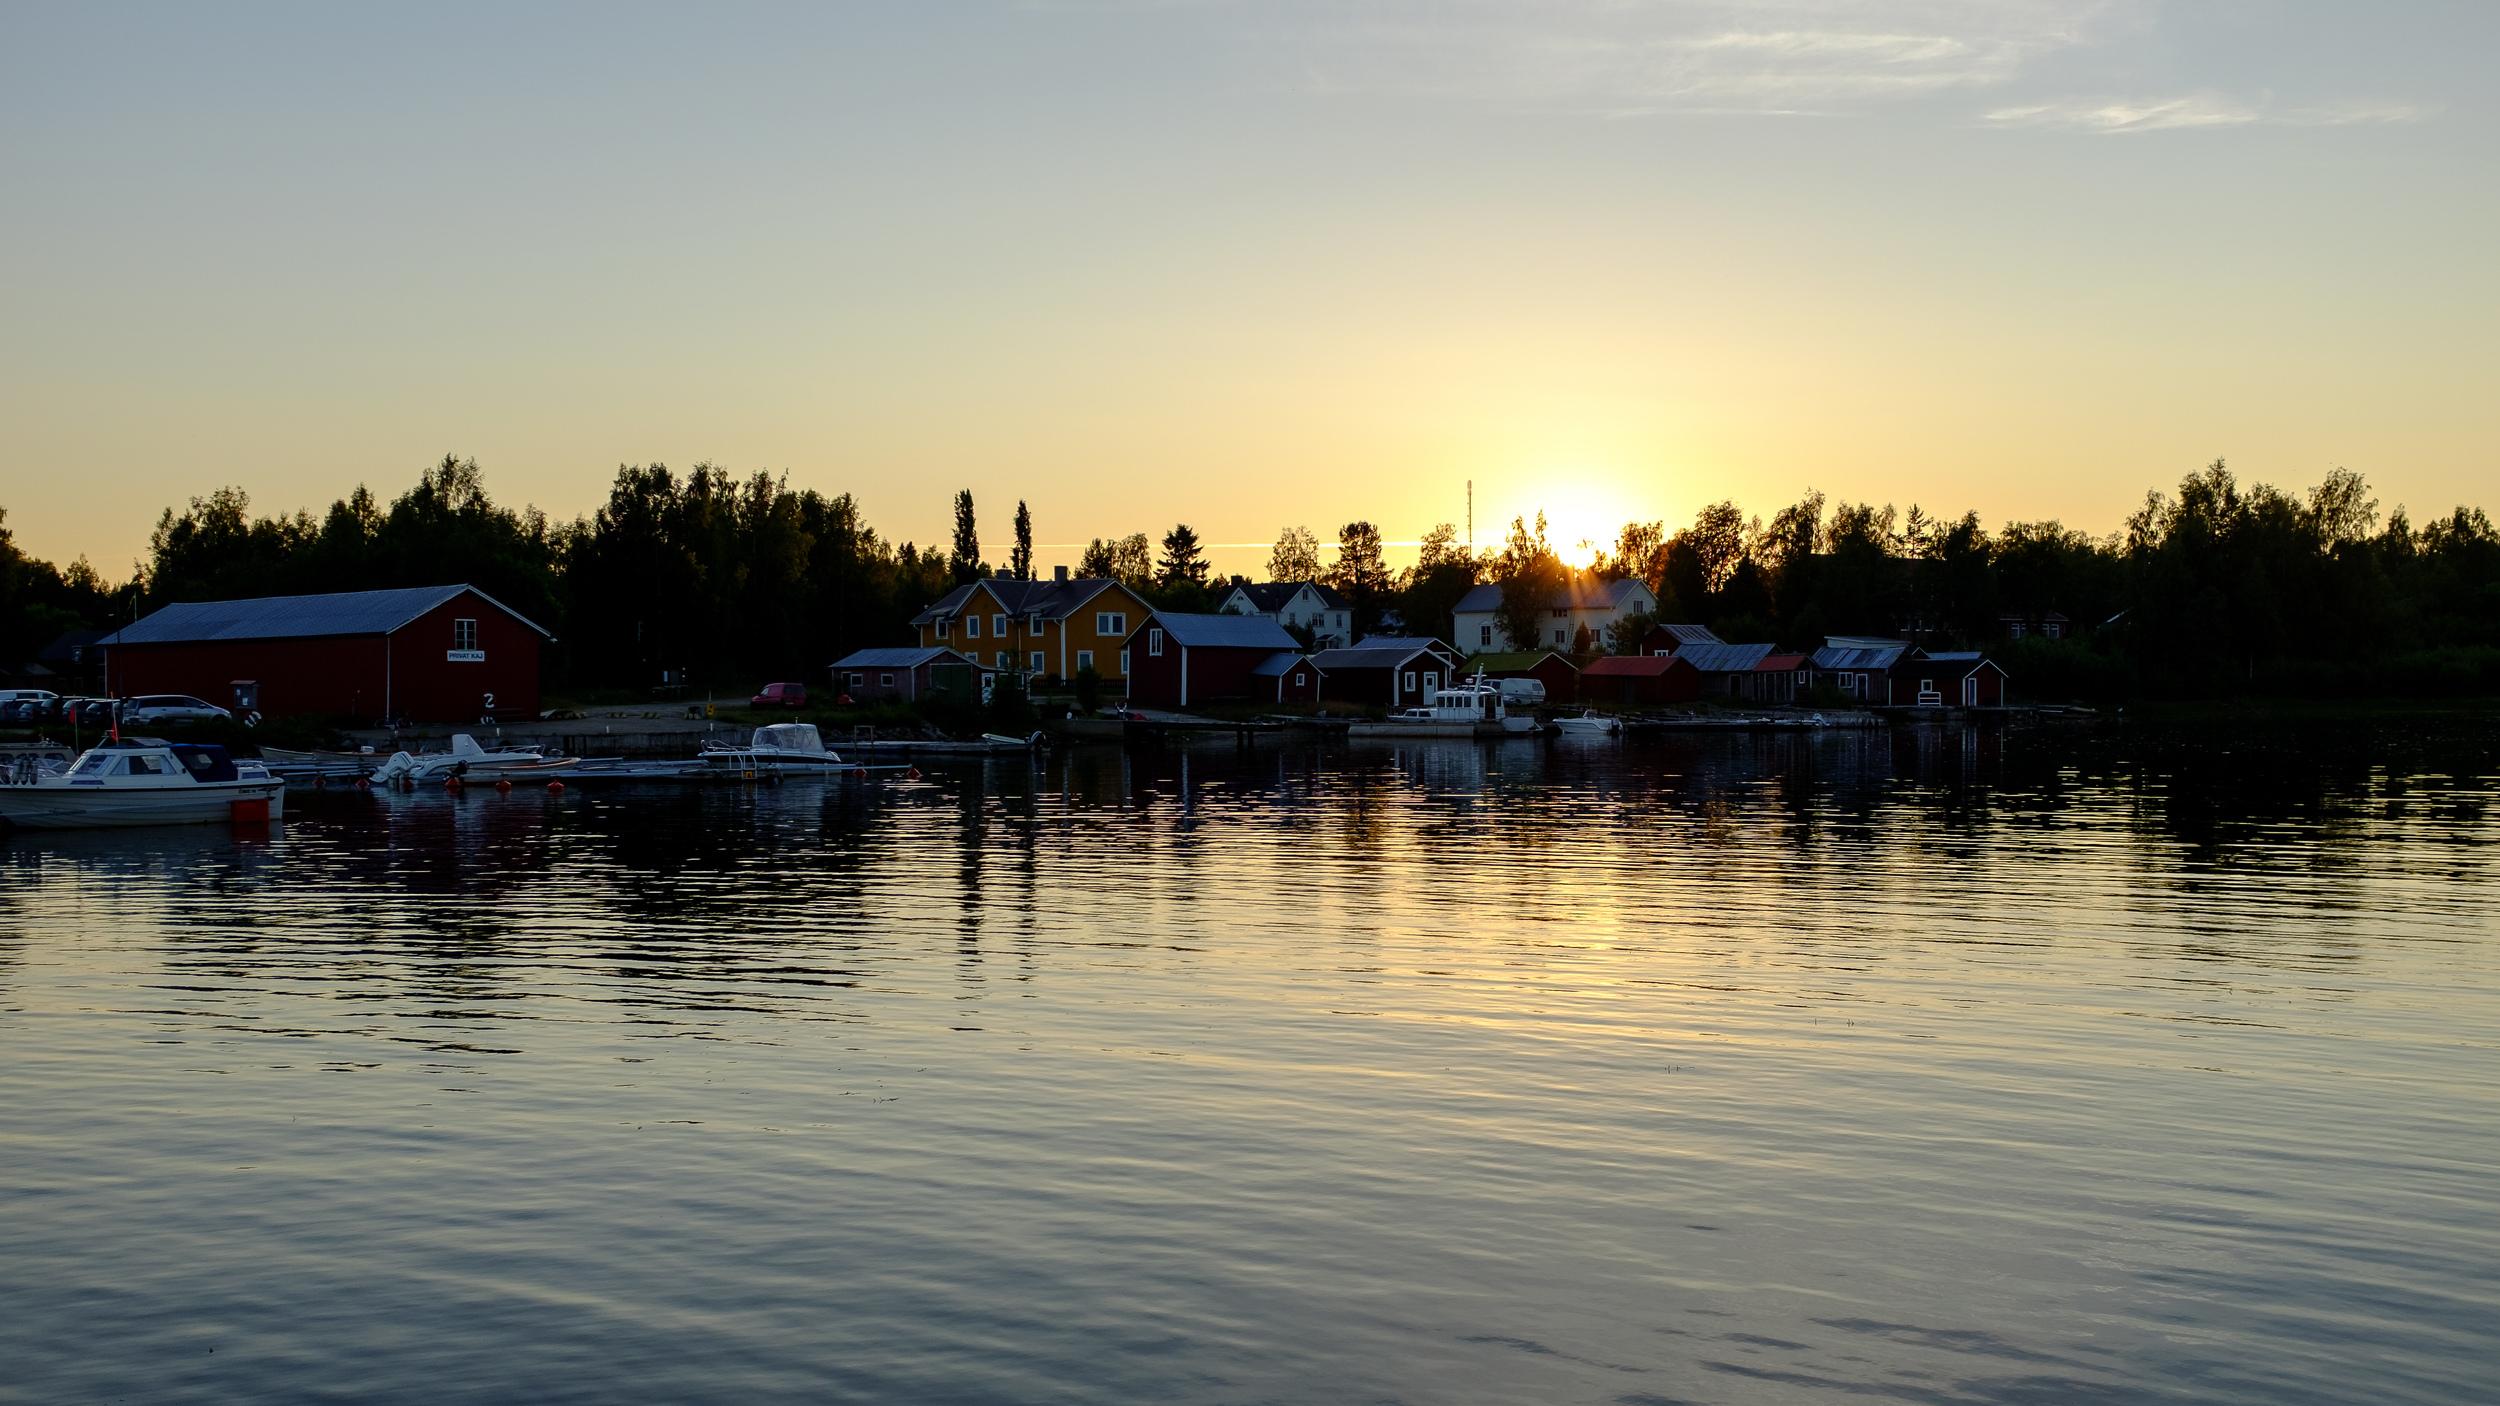 Norrland-5598.jpg